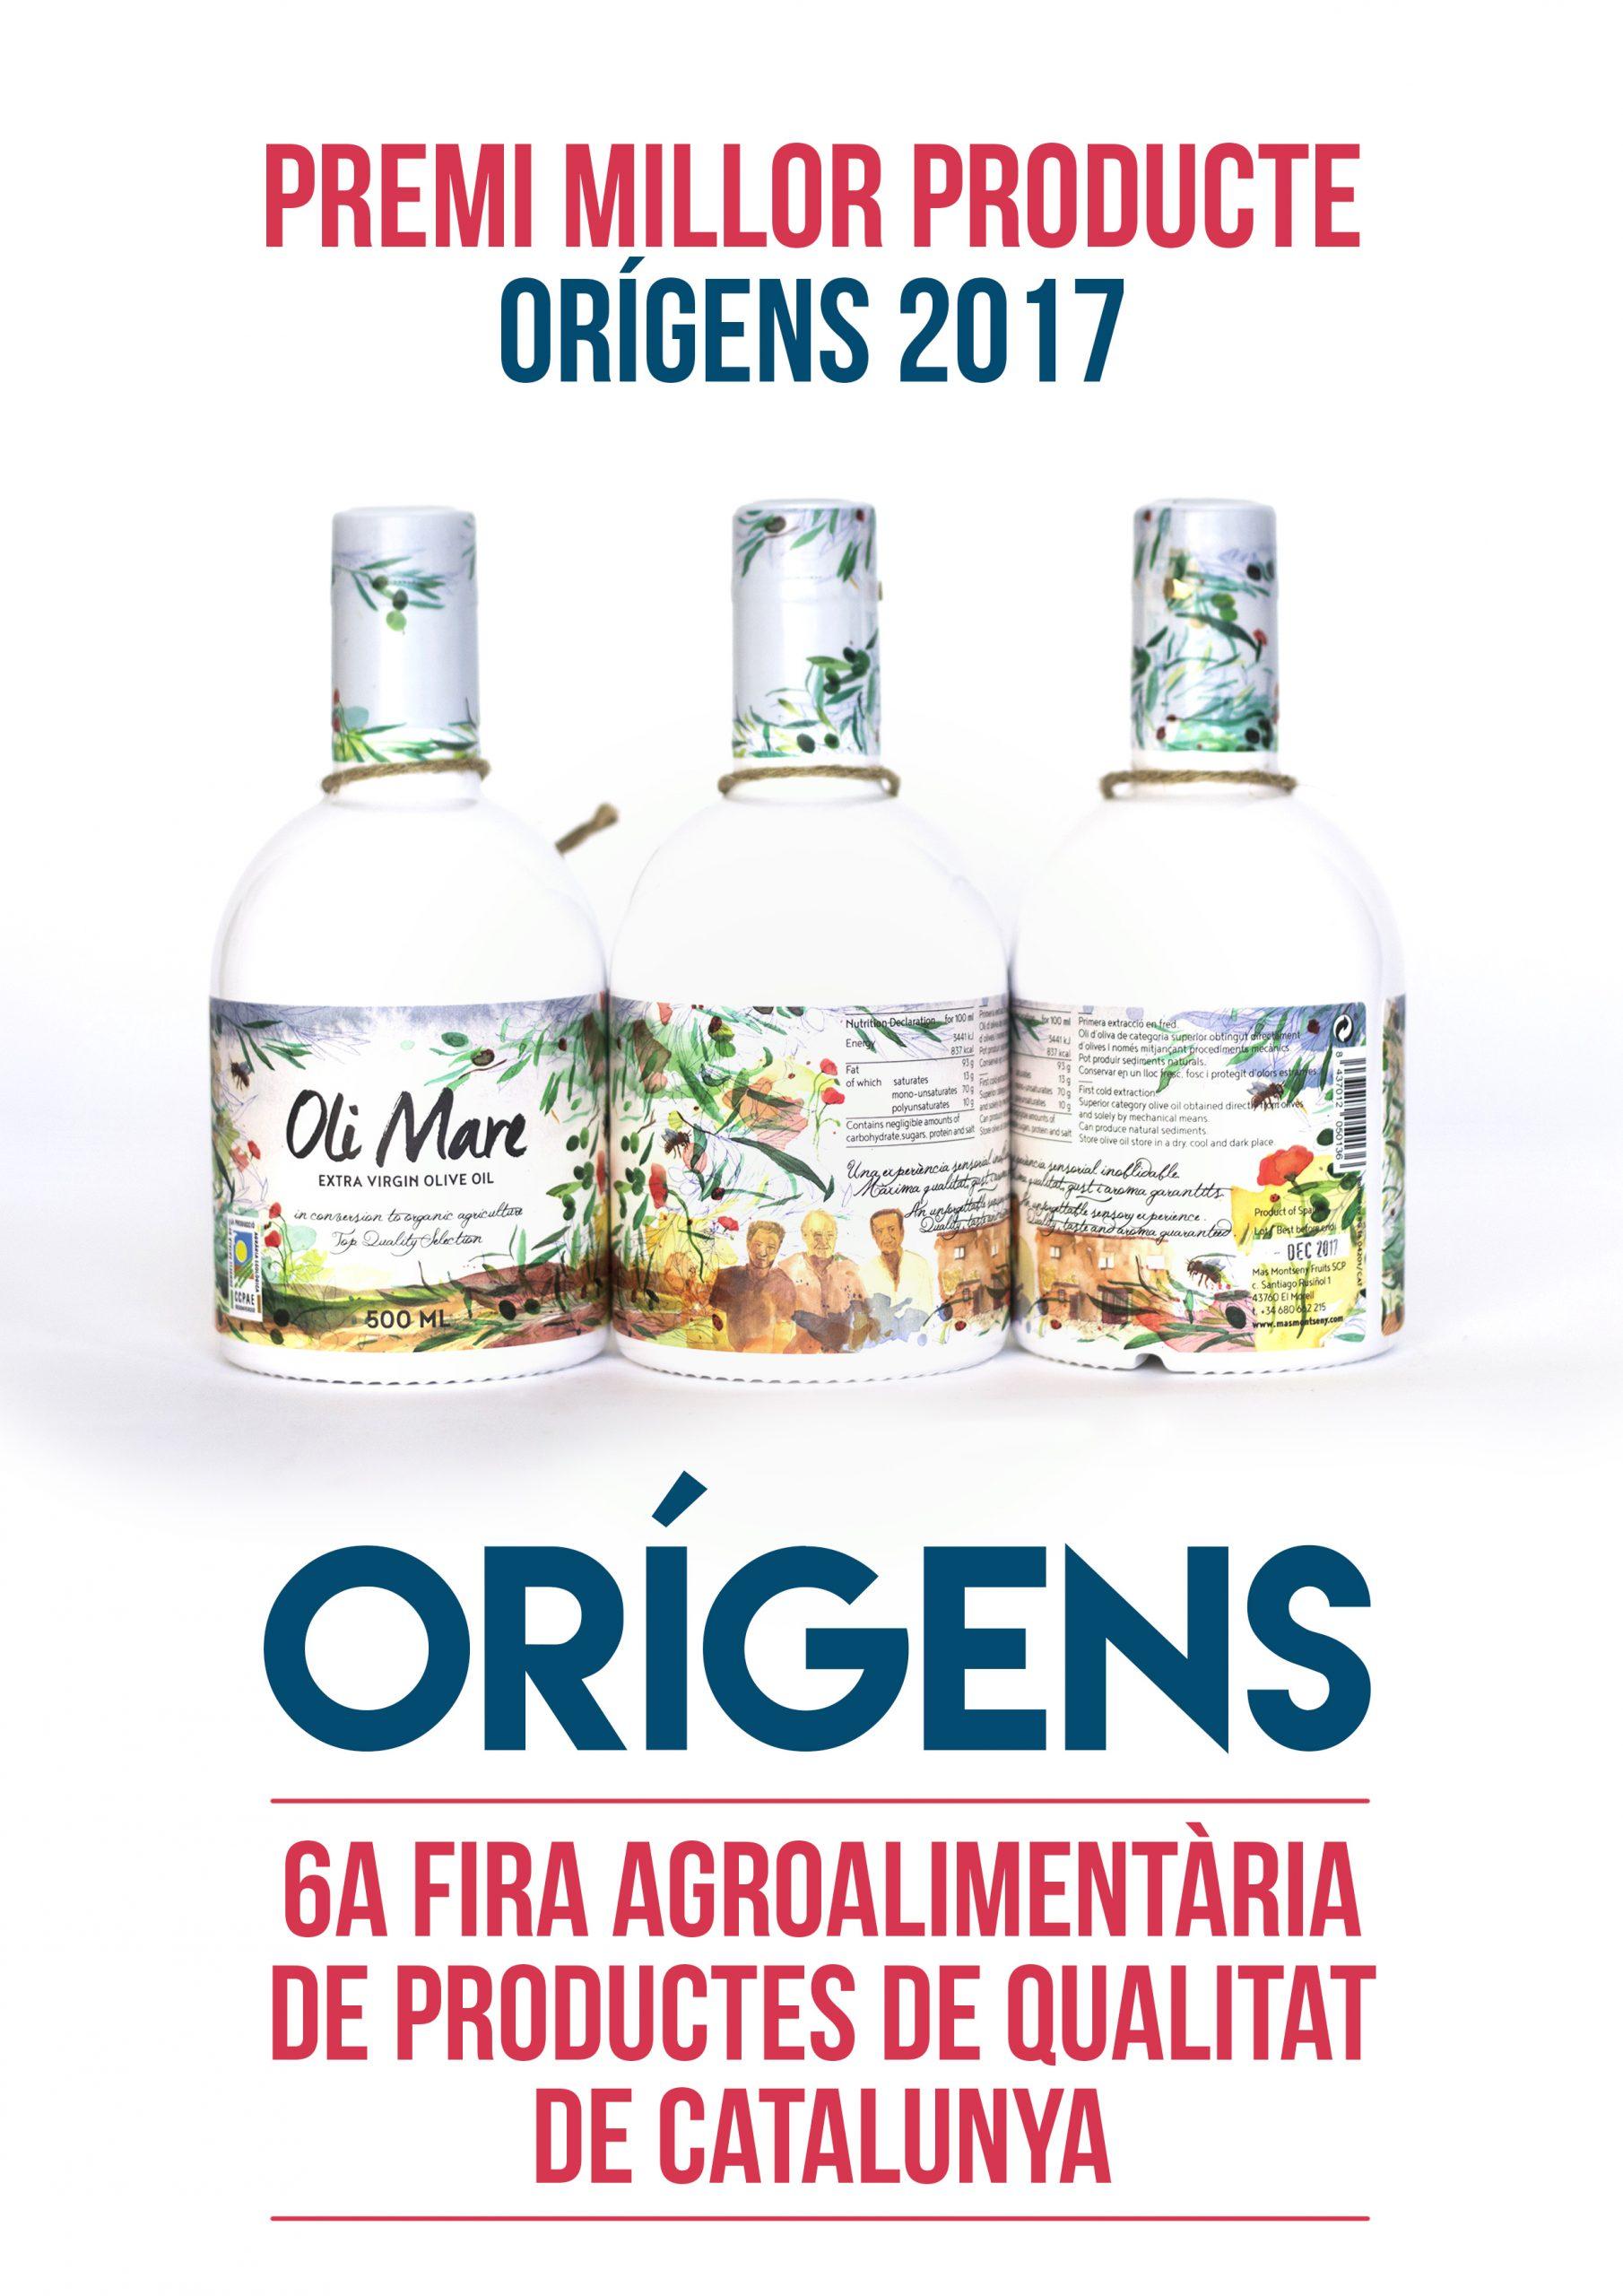 CARTELLS FIRA ORIGENS MASMONTSENY